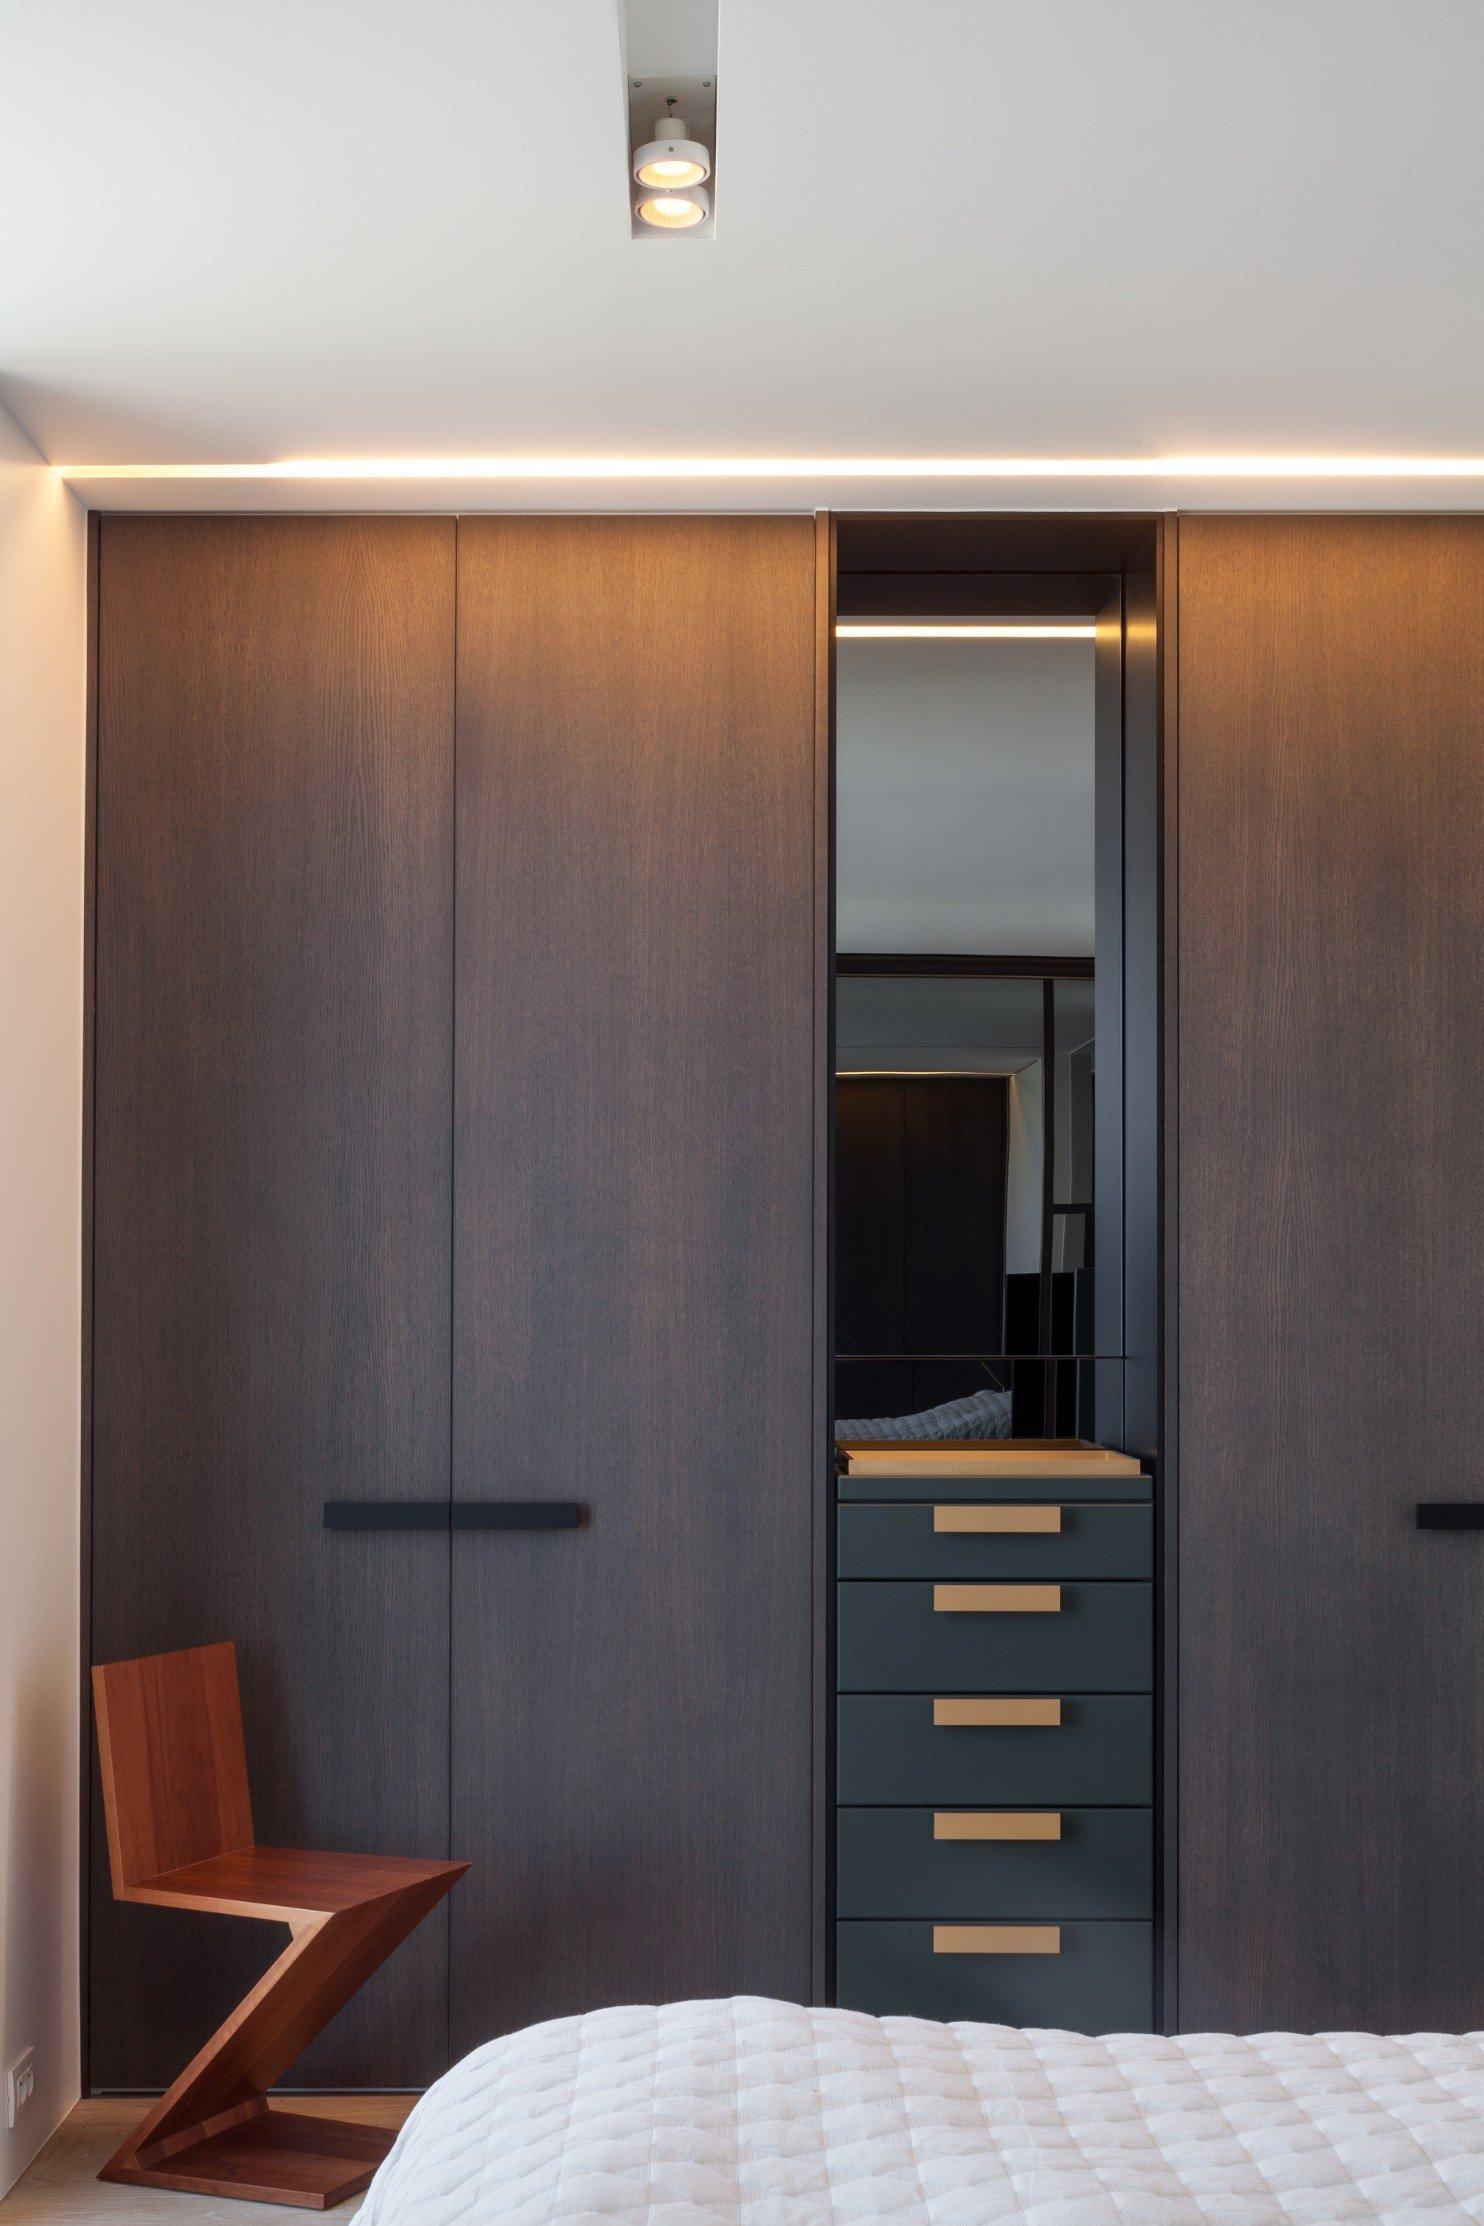 Rietveldprojects-penthouse-appartement-design-architectuur-kust14